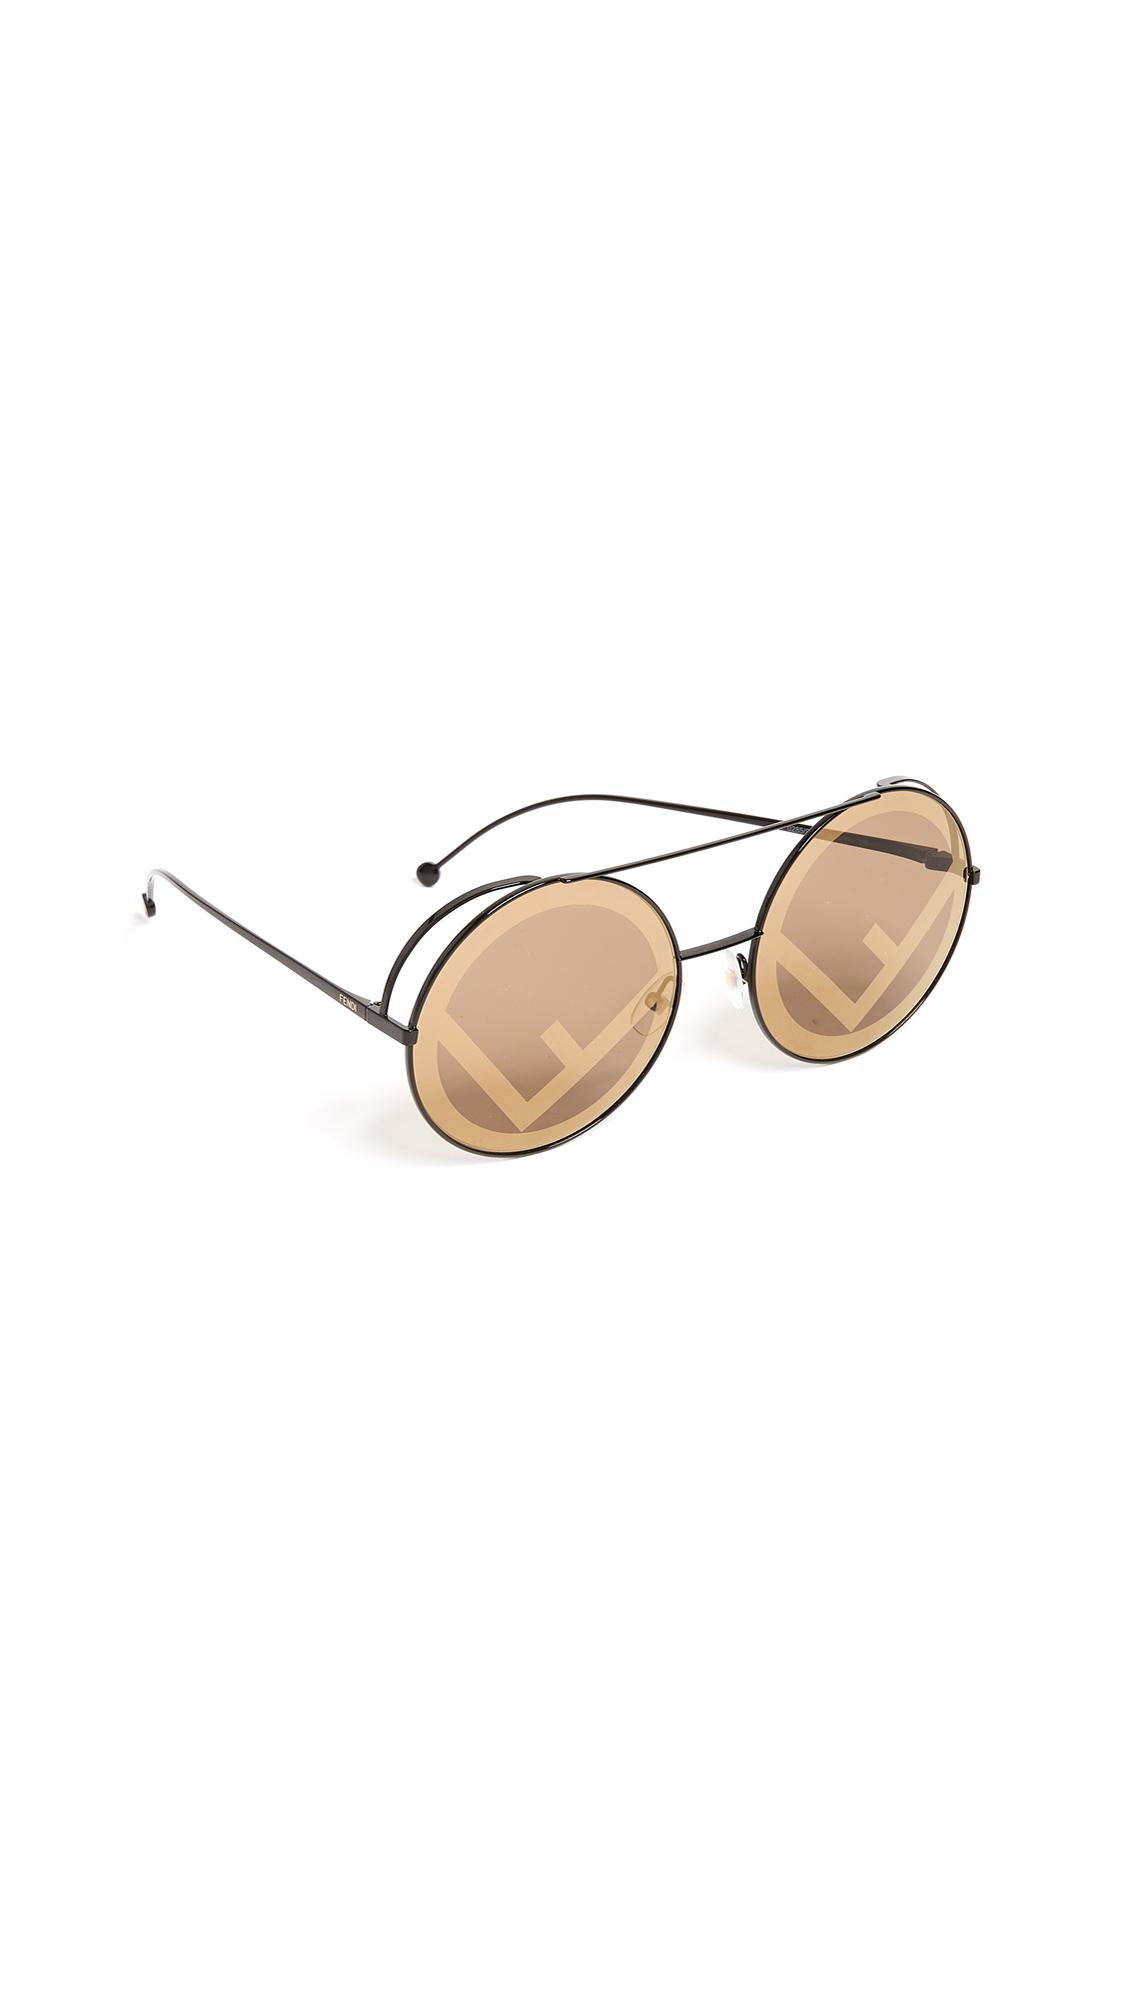 Fendi Round Holographic Sunglasses